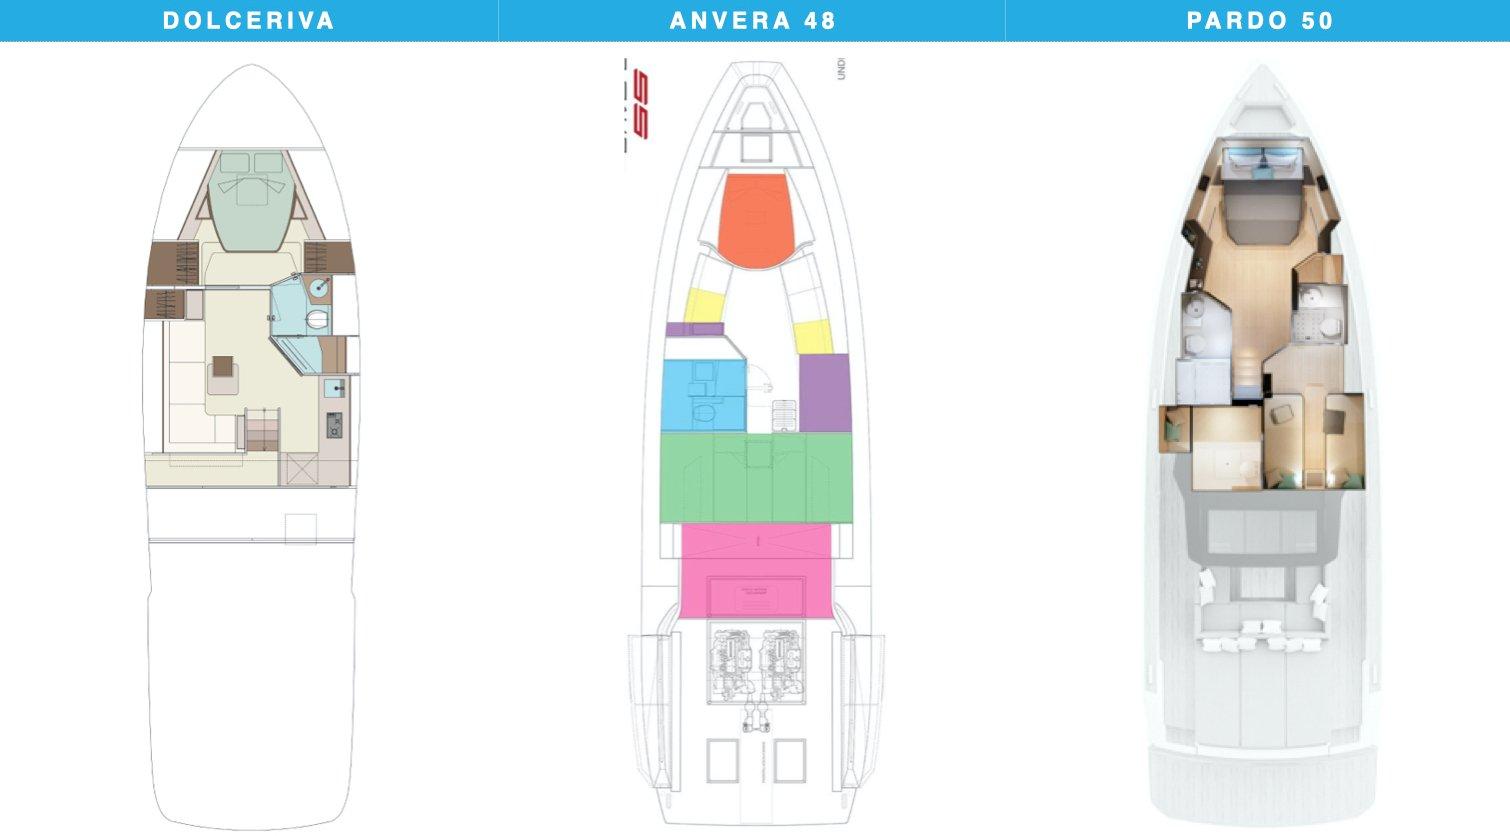 Deckplan comp.002